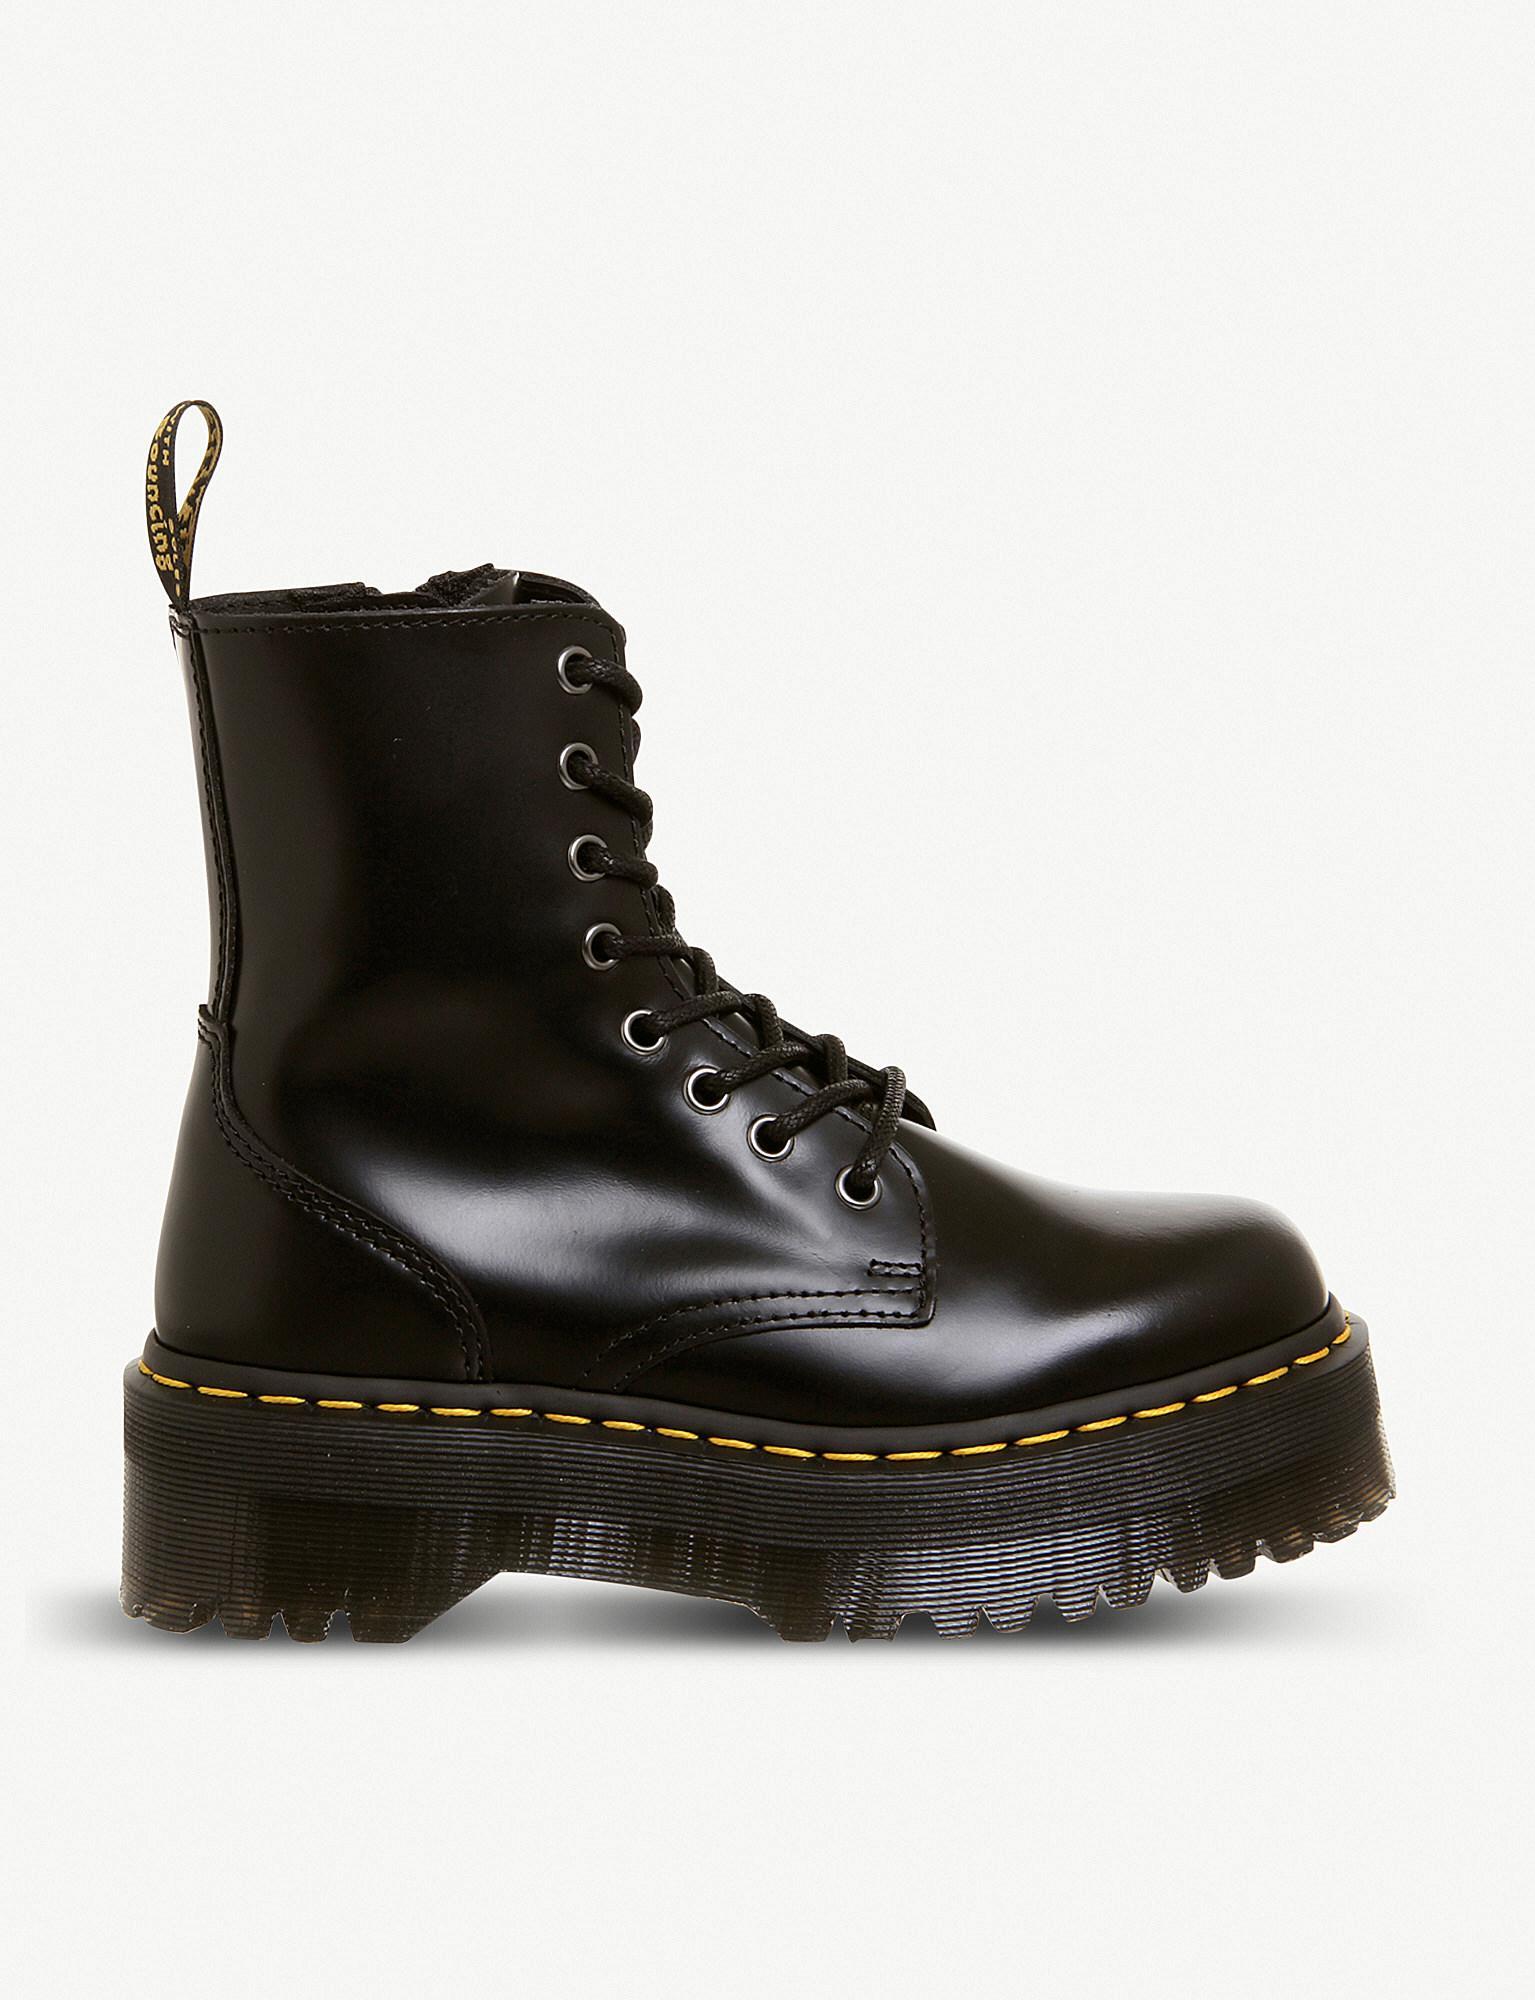 eedfb2c1cb55 Lyst - Dr. Martens Jadon 8-eye Leather Platform Boots in Black